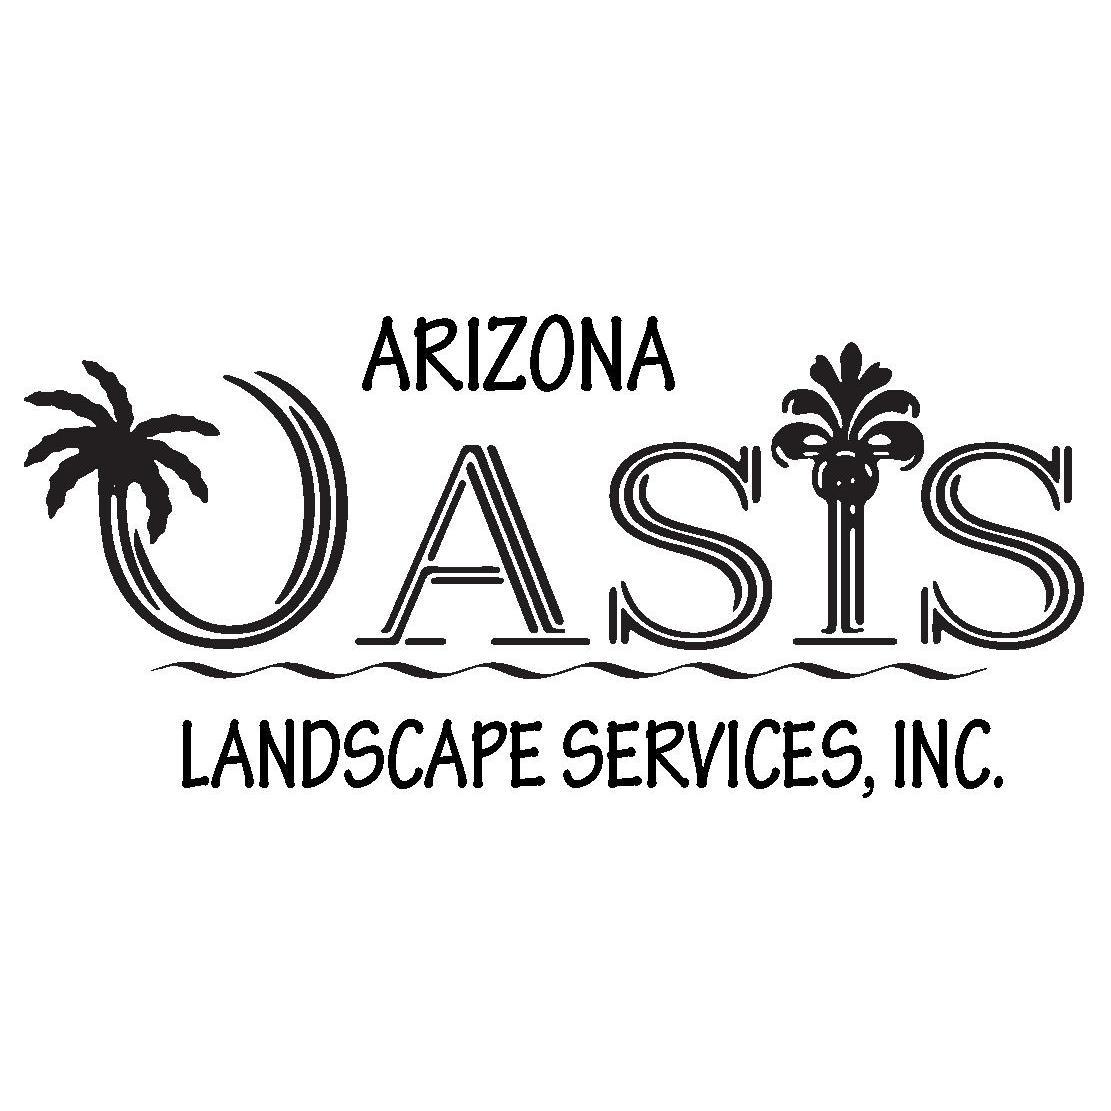 Arizona Oasis Landscape Services, Inc.